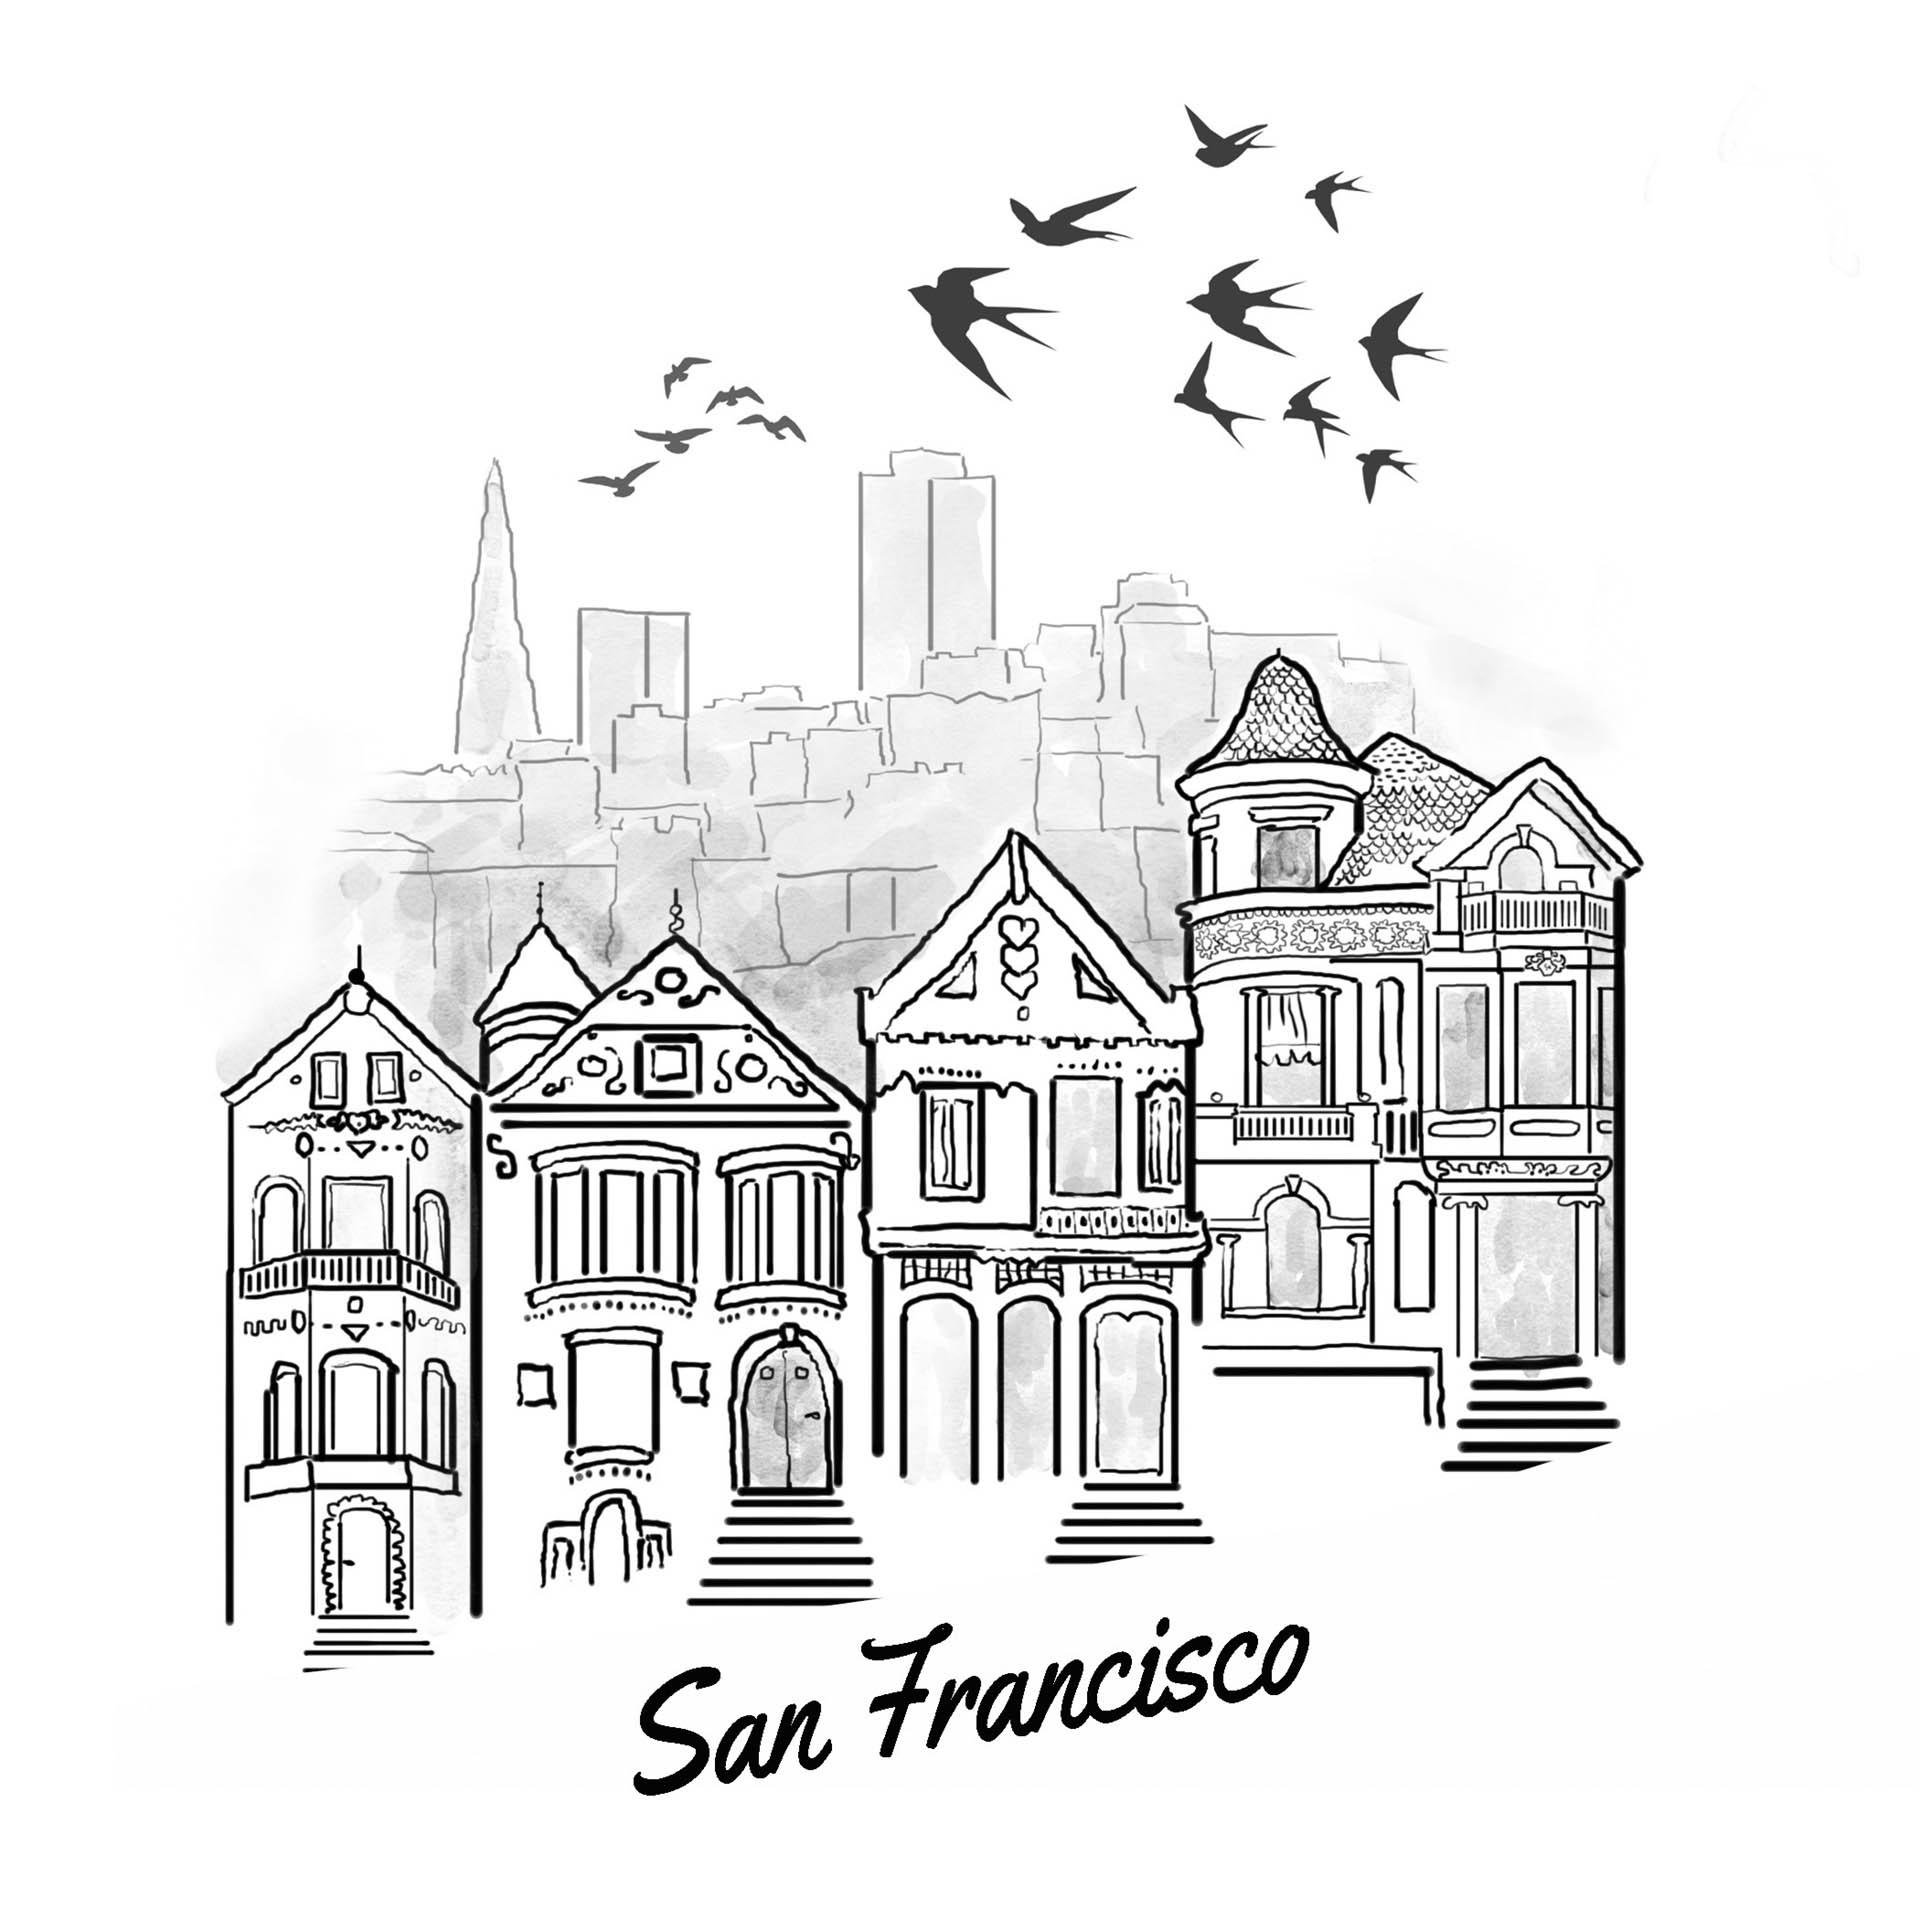 San Francisco Inktober Illustration 2020 • Project: They Draw & Travel